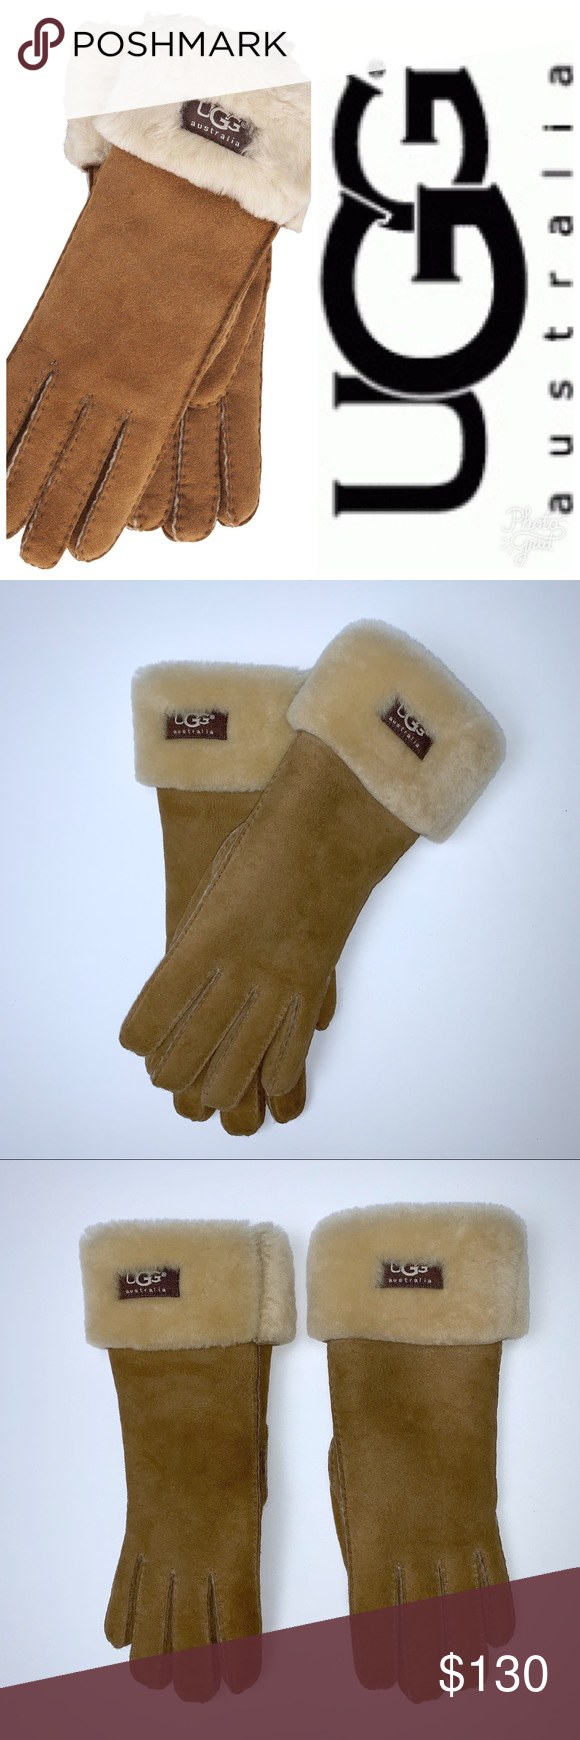 787f8e1e545 UGG Women's Turn Cuff Sheepskin Leather Gloves EUC - Worn all of 3X ...